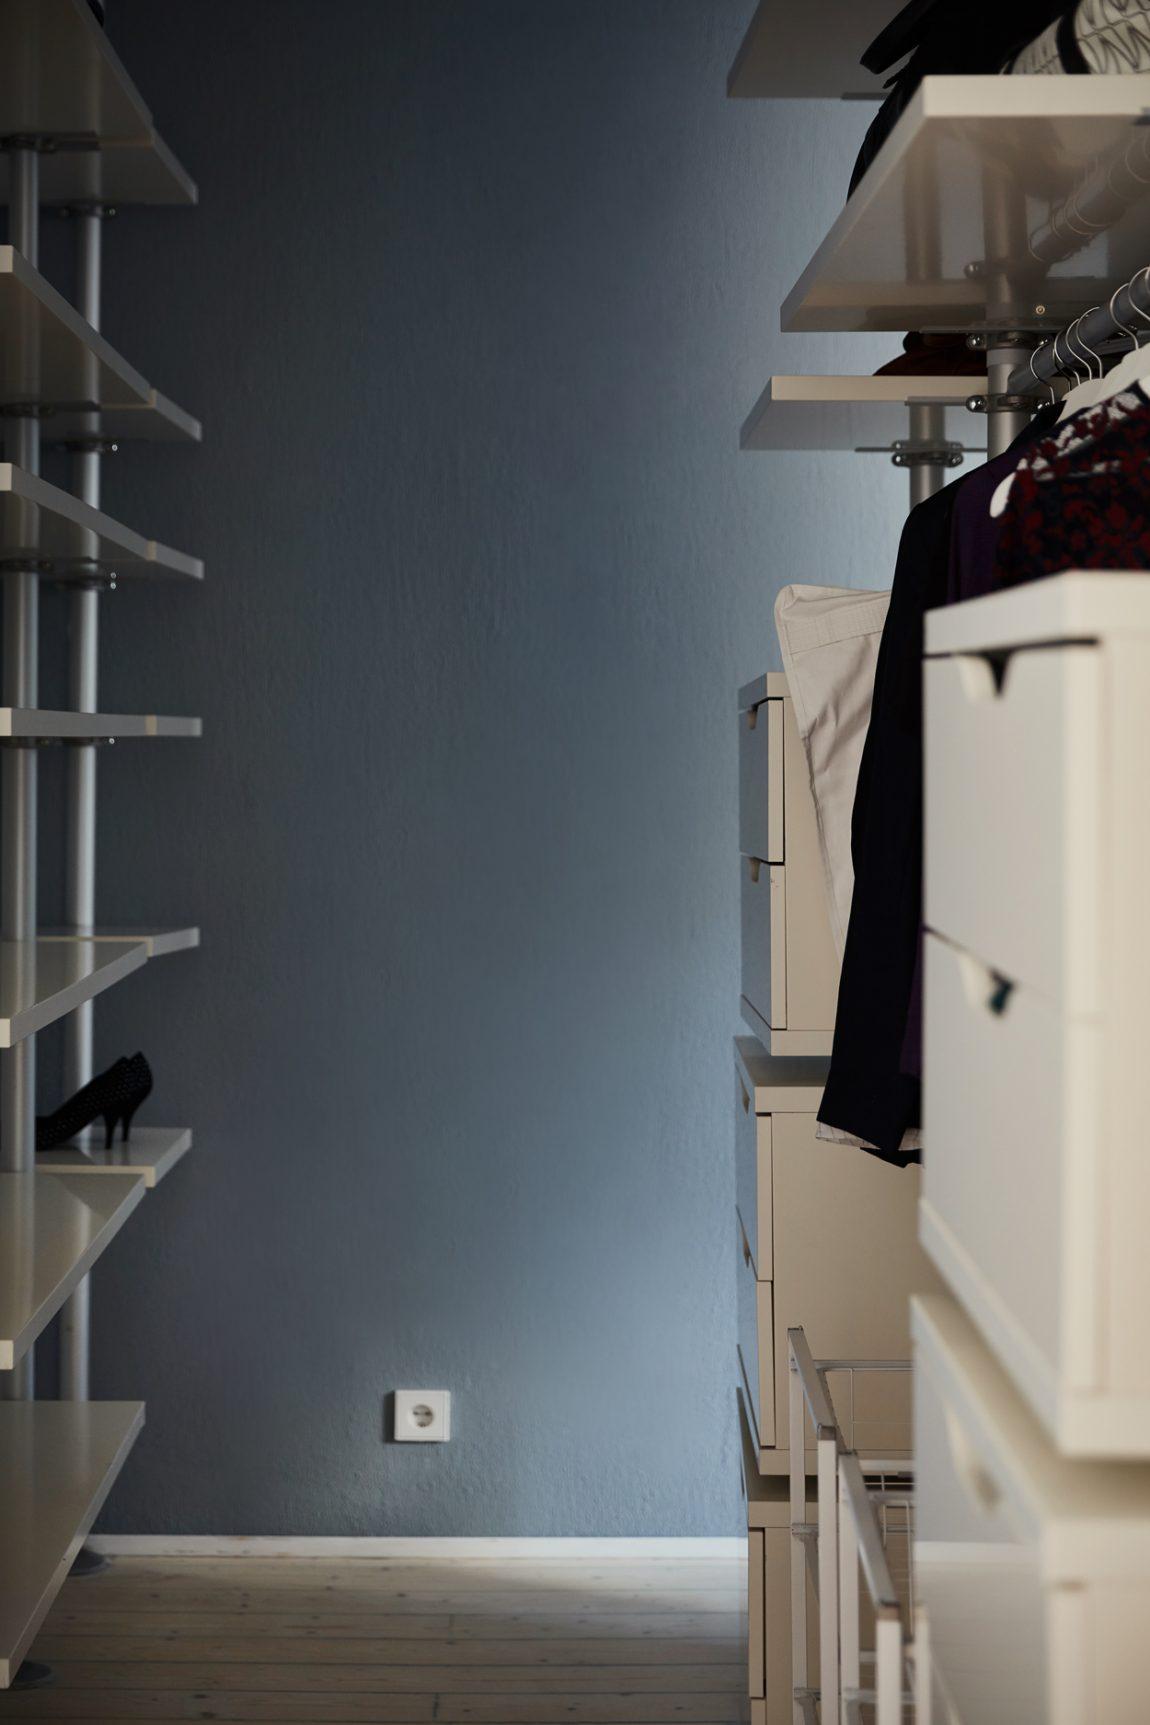 ikea stolmen inloopkast slaapkamer